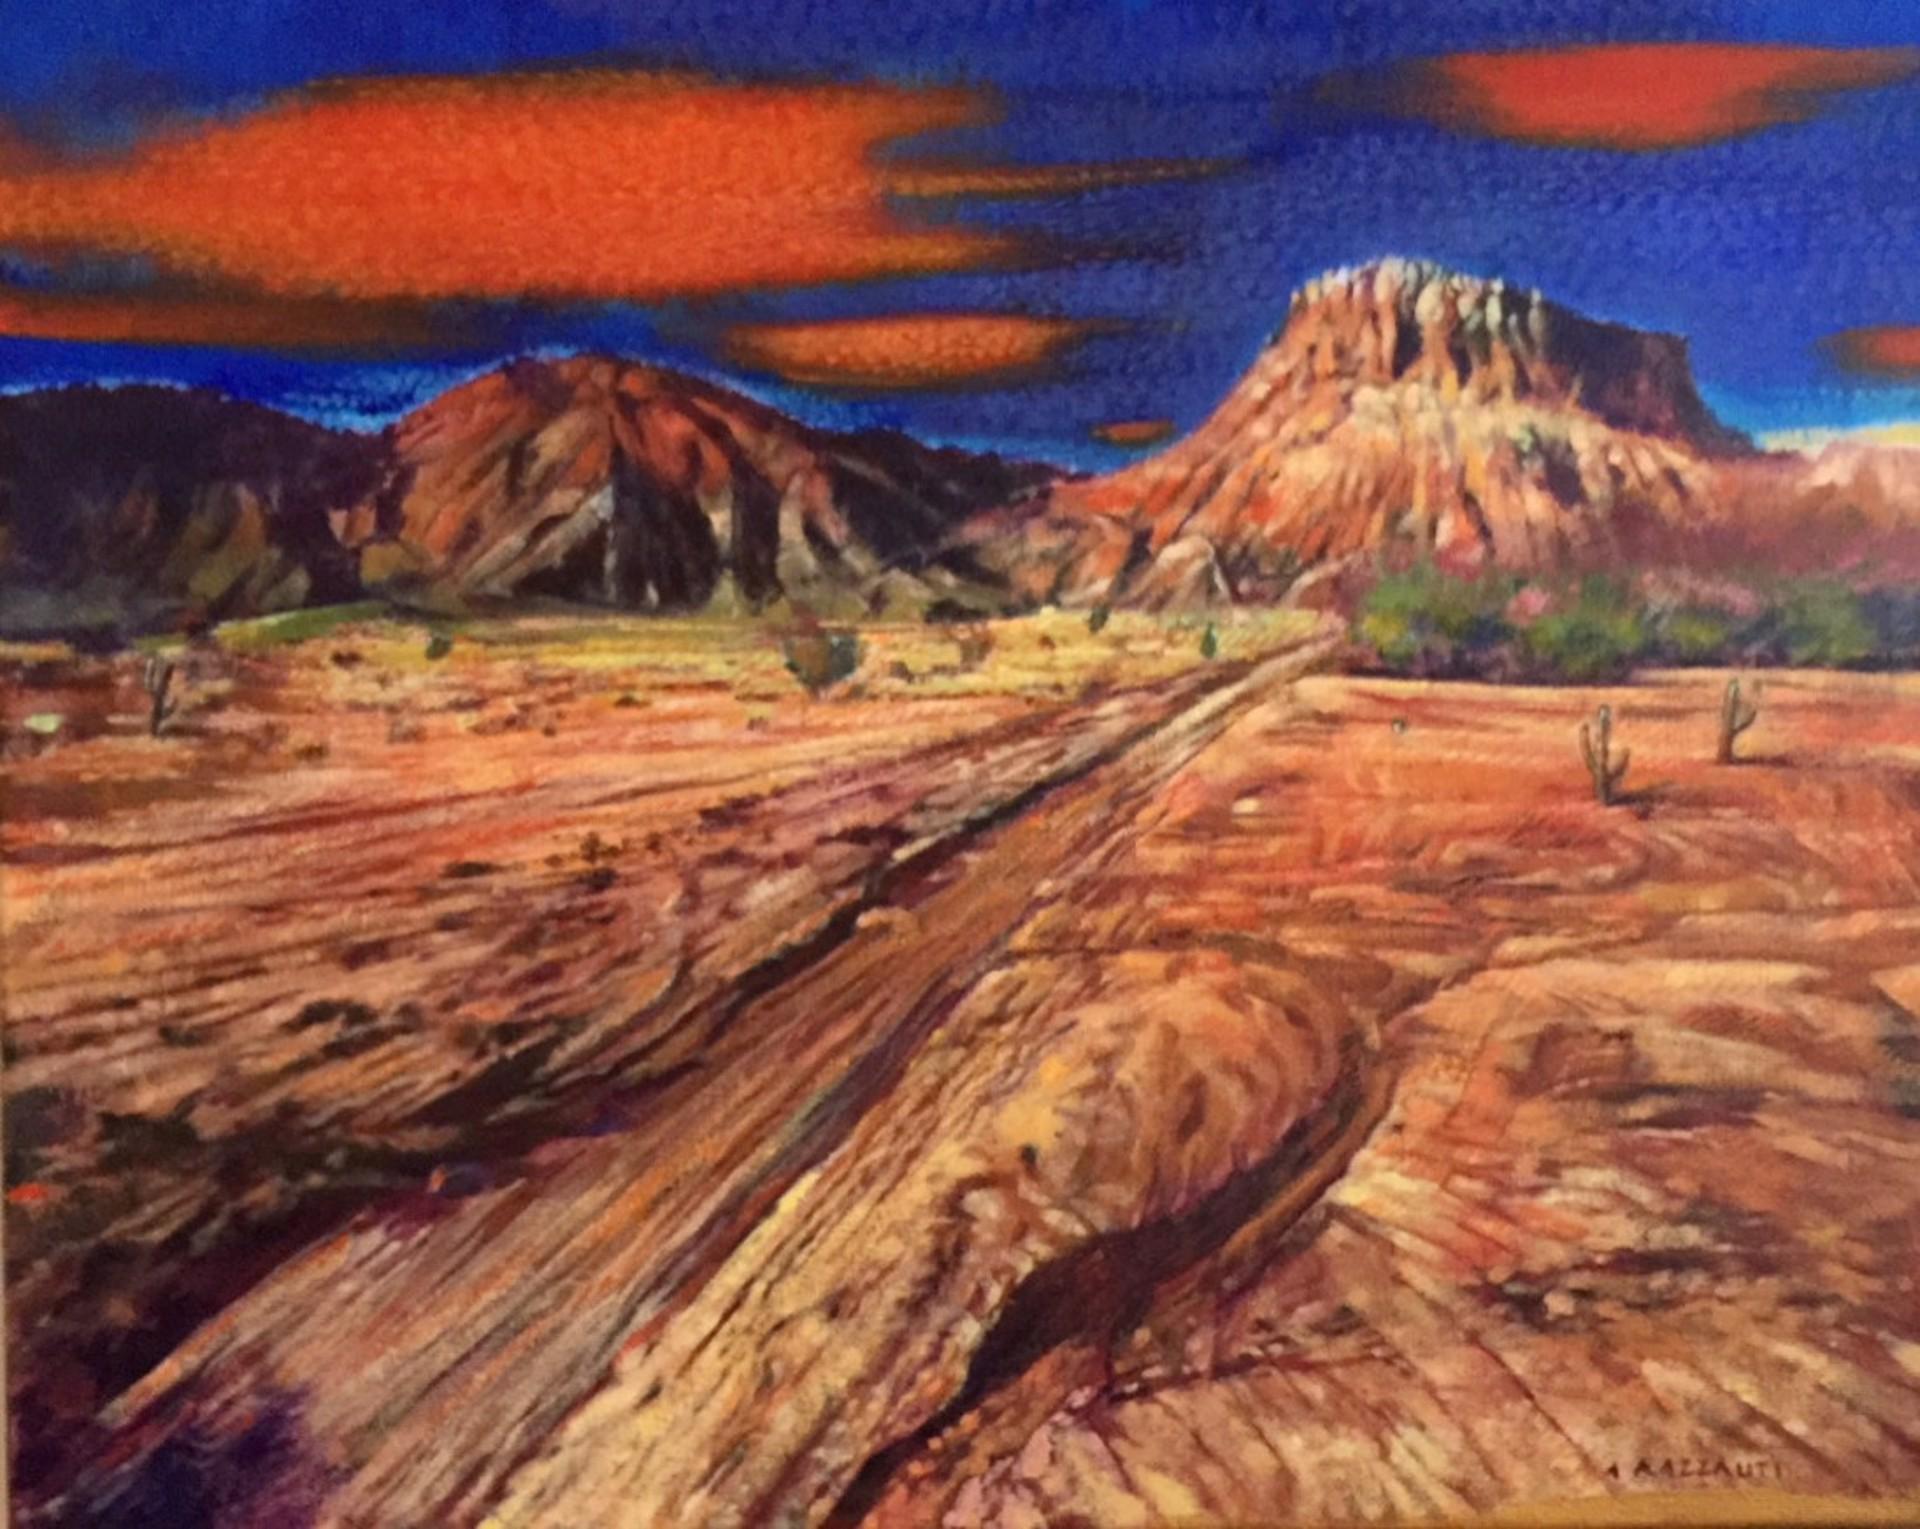 New Mexico by Andrea Razzauti